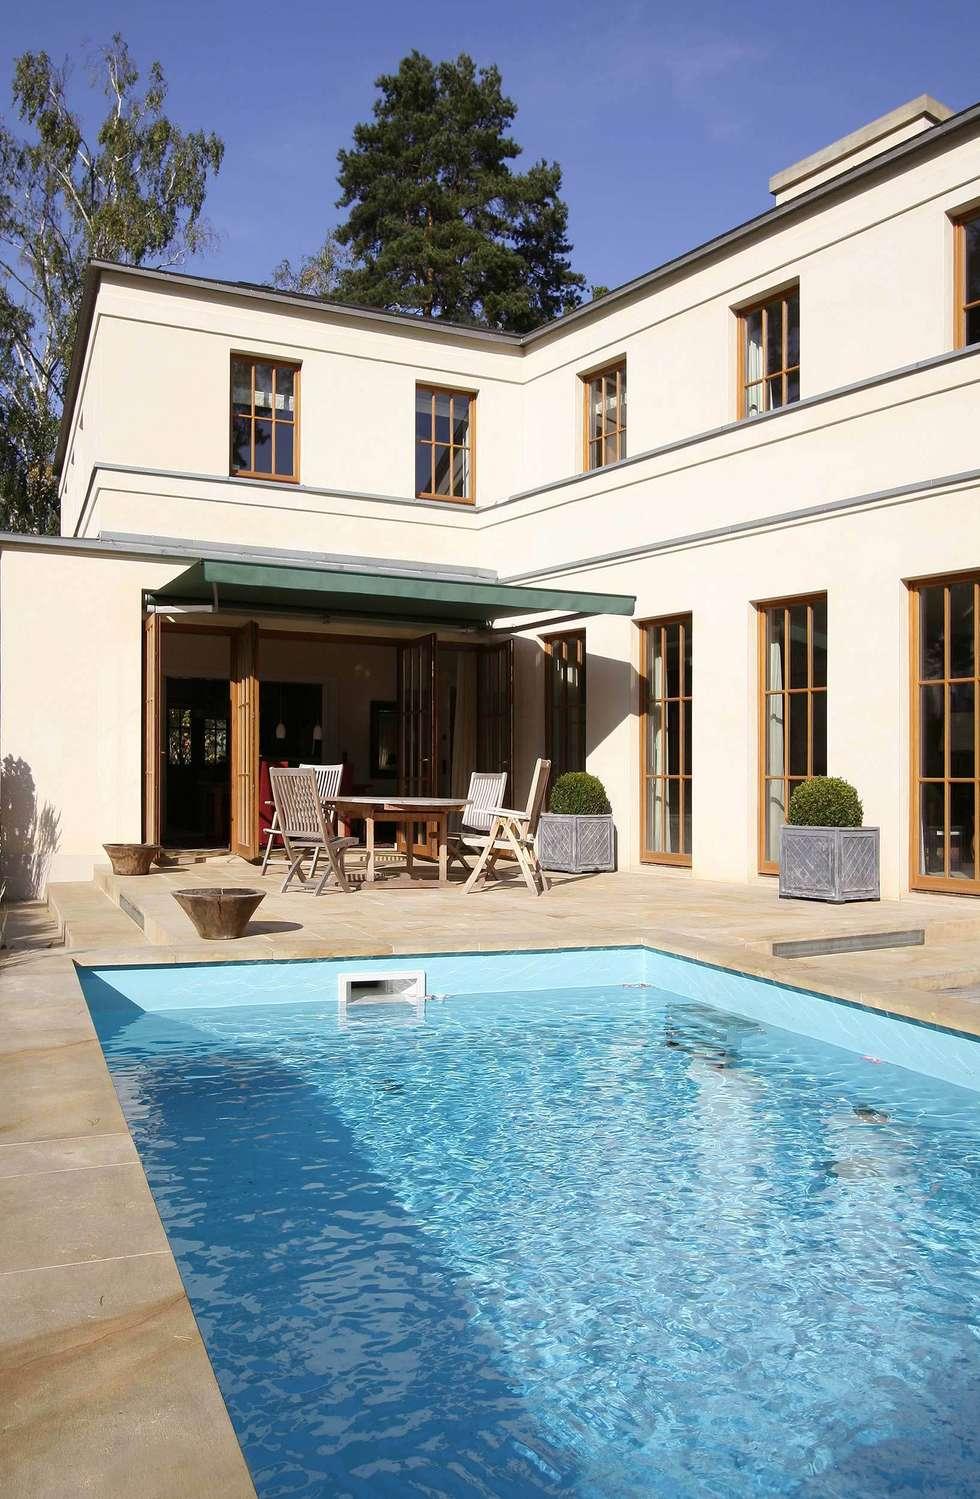 English inspired - Domizil mit Landhausflair: landhausstil Pool von CG VOGEL ARCHITEKTEN